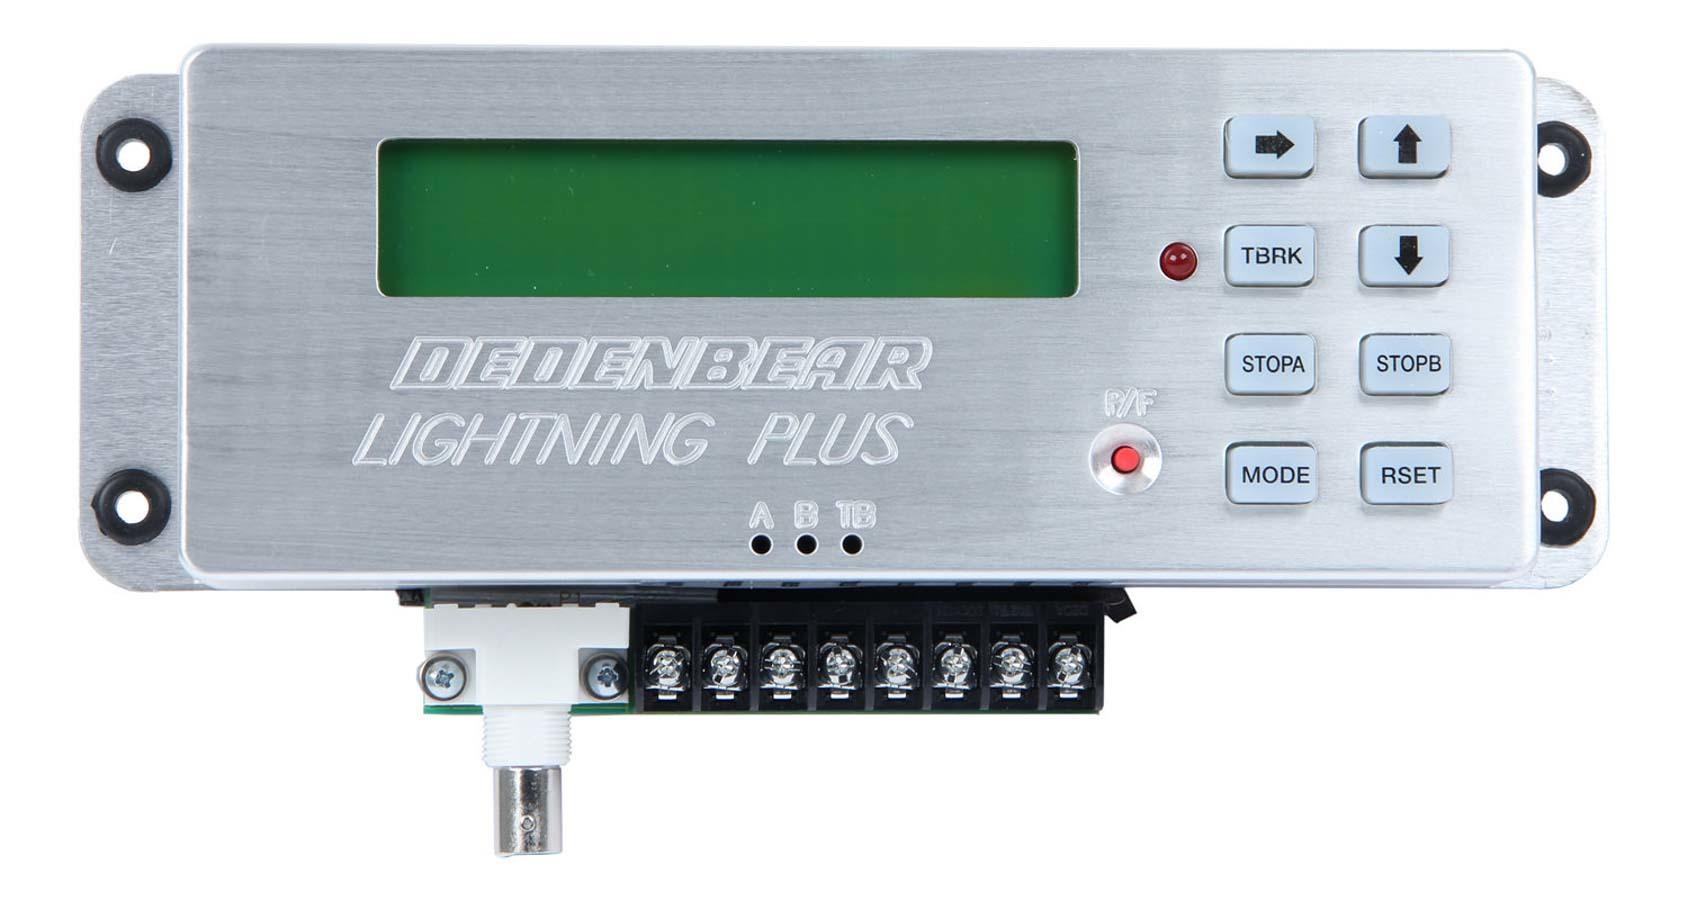 Dedenbear Lightning Plus Delay Box